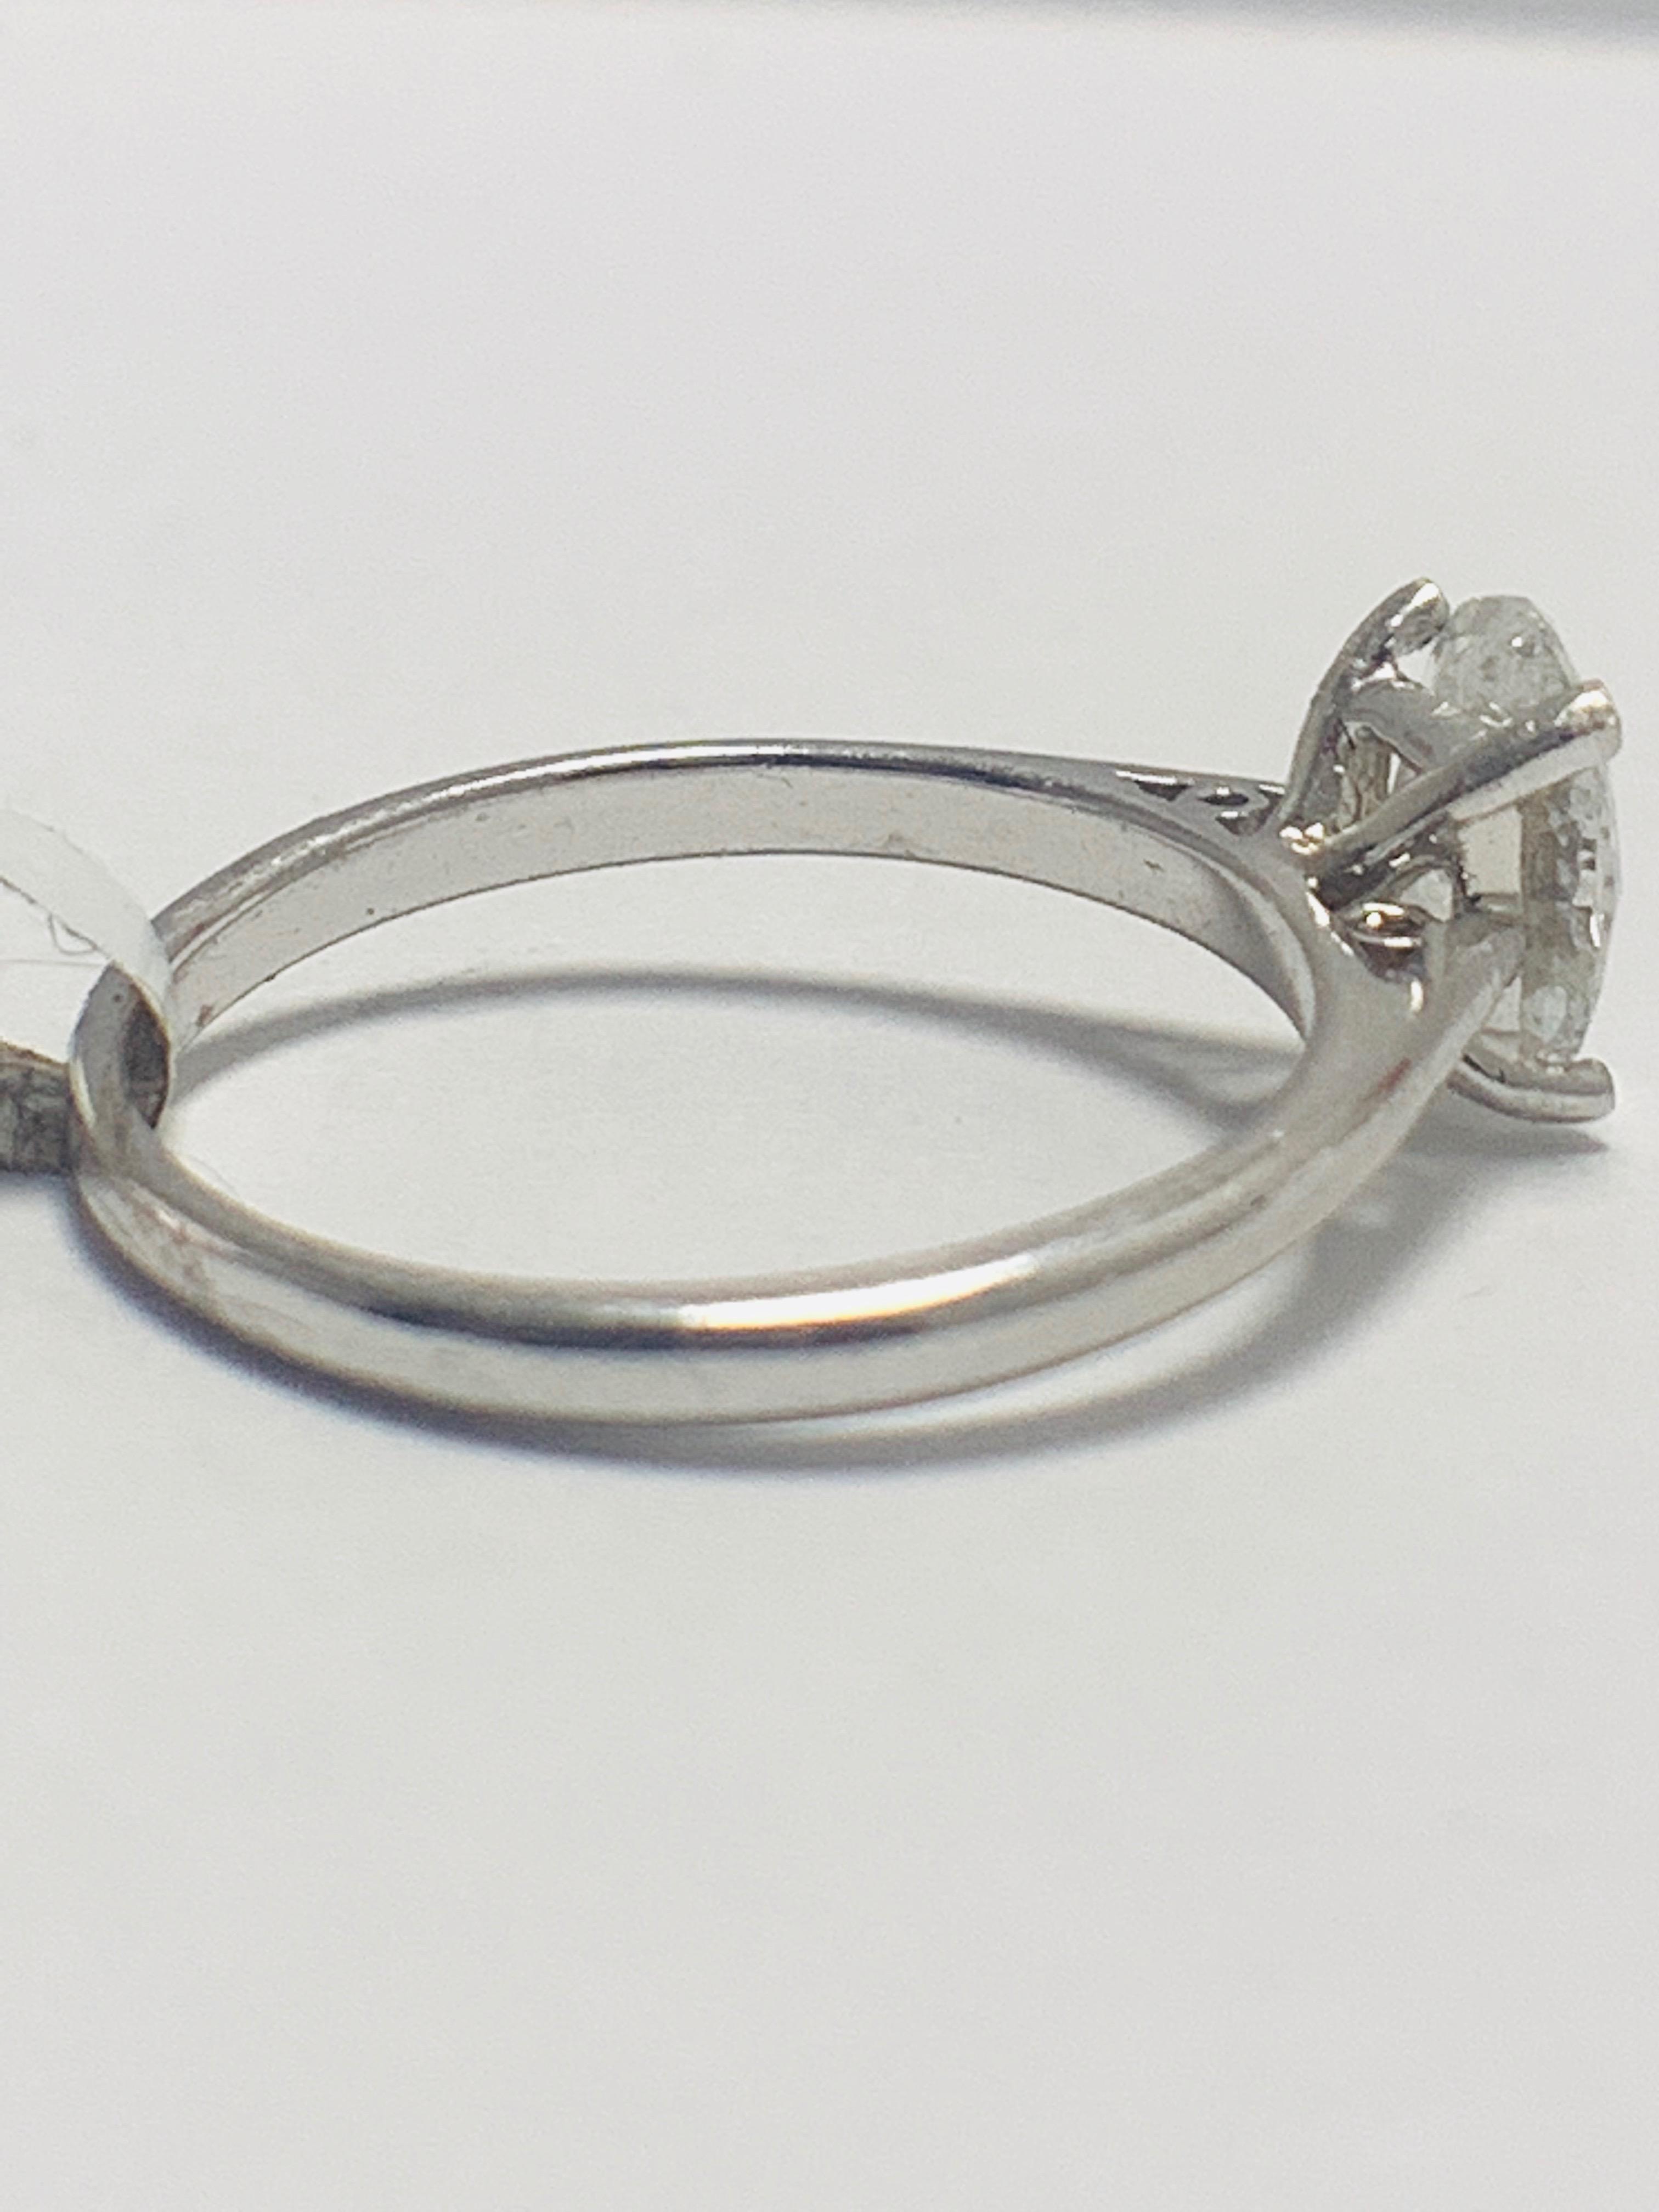 Lot 24 - 1ct Oval diamond solitaire platinum ring